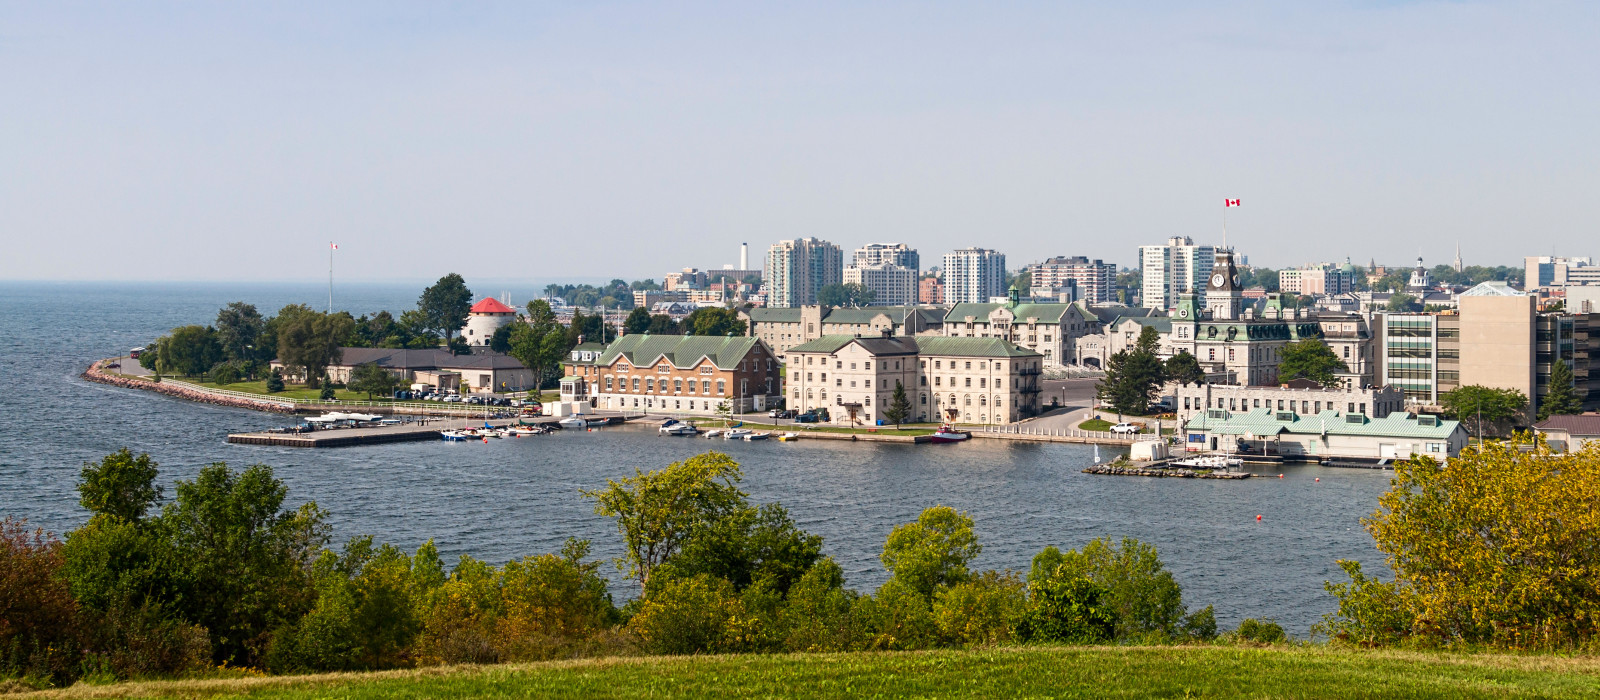 Reiseziel Kingston Kanada